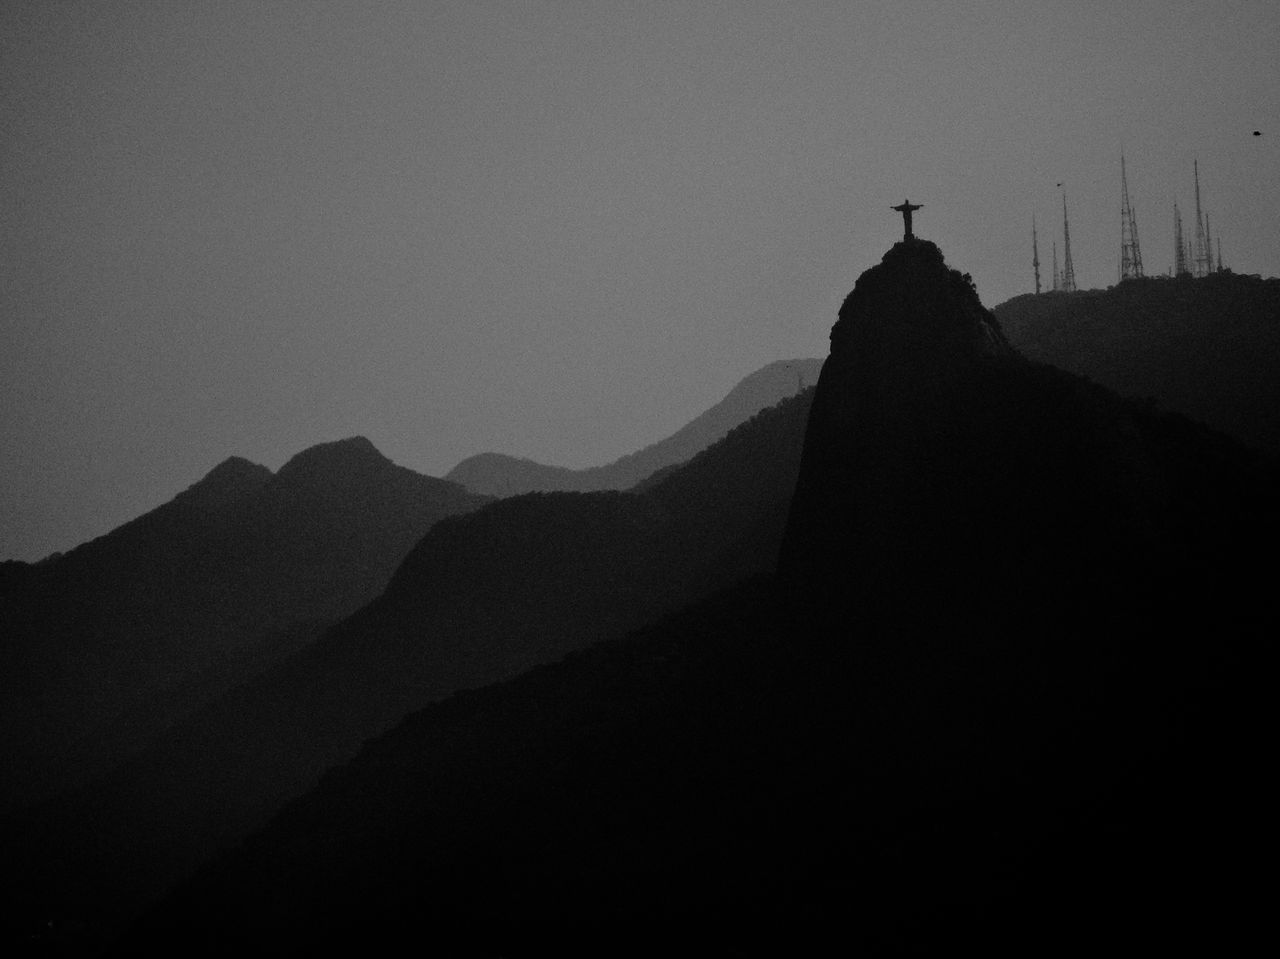 Architecture Beauty In Nature Blackandwhite Christ Day Jesus Mountain Mountain Range Mystic Nature No People Outdoors Rio De Janeiro Silhouette Sky